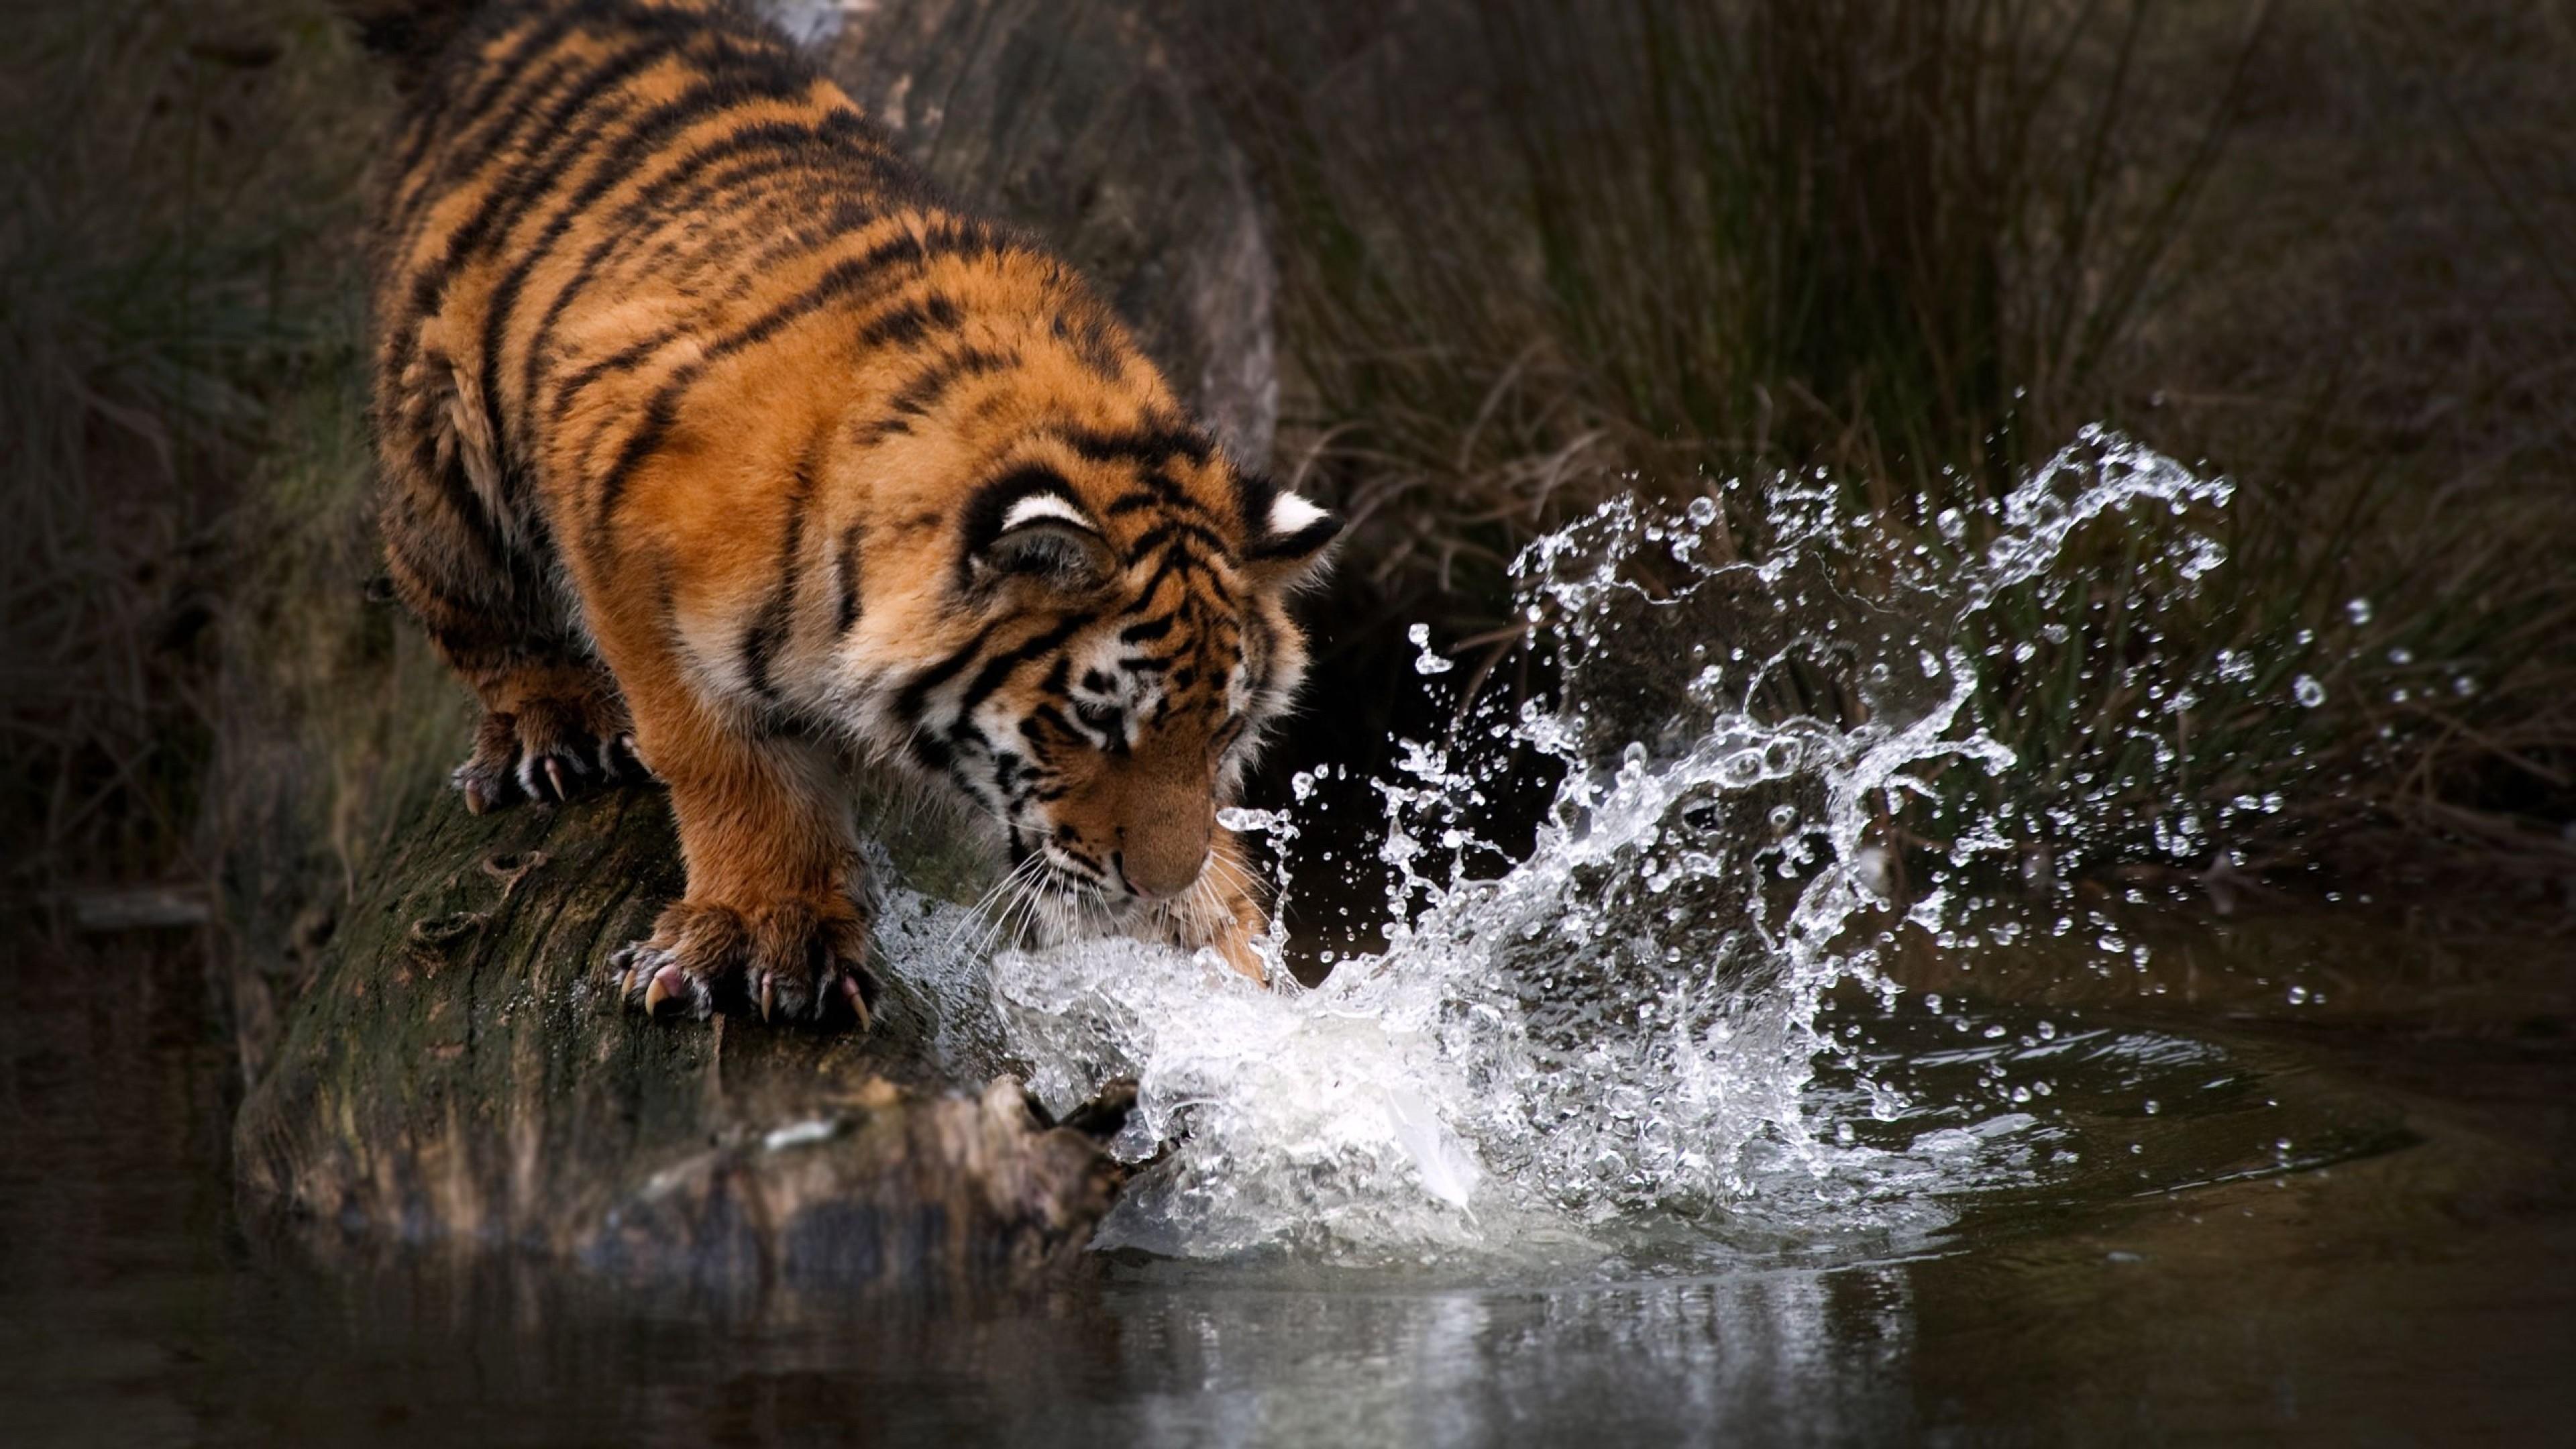 8k Animal Wallpaper Download: Tiger Water 4k, HD Animals, 4k Wallpapers, Images